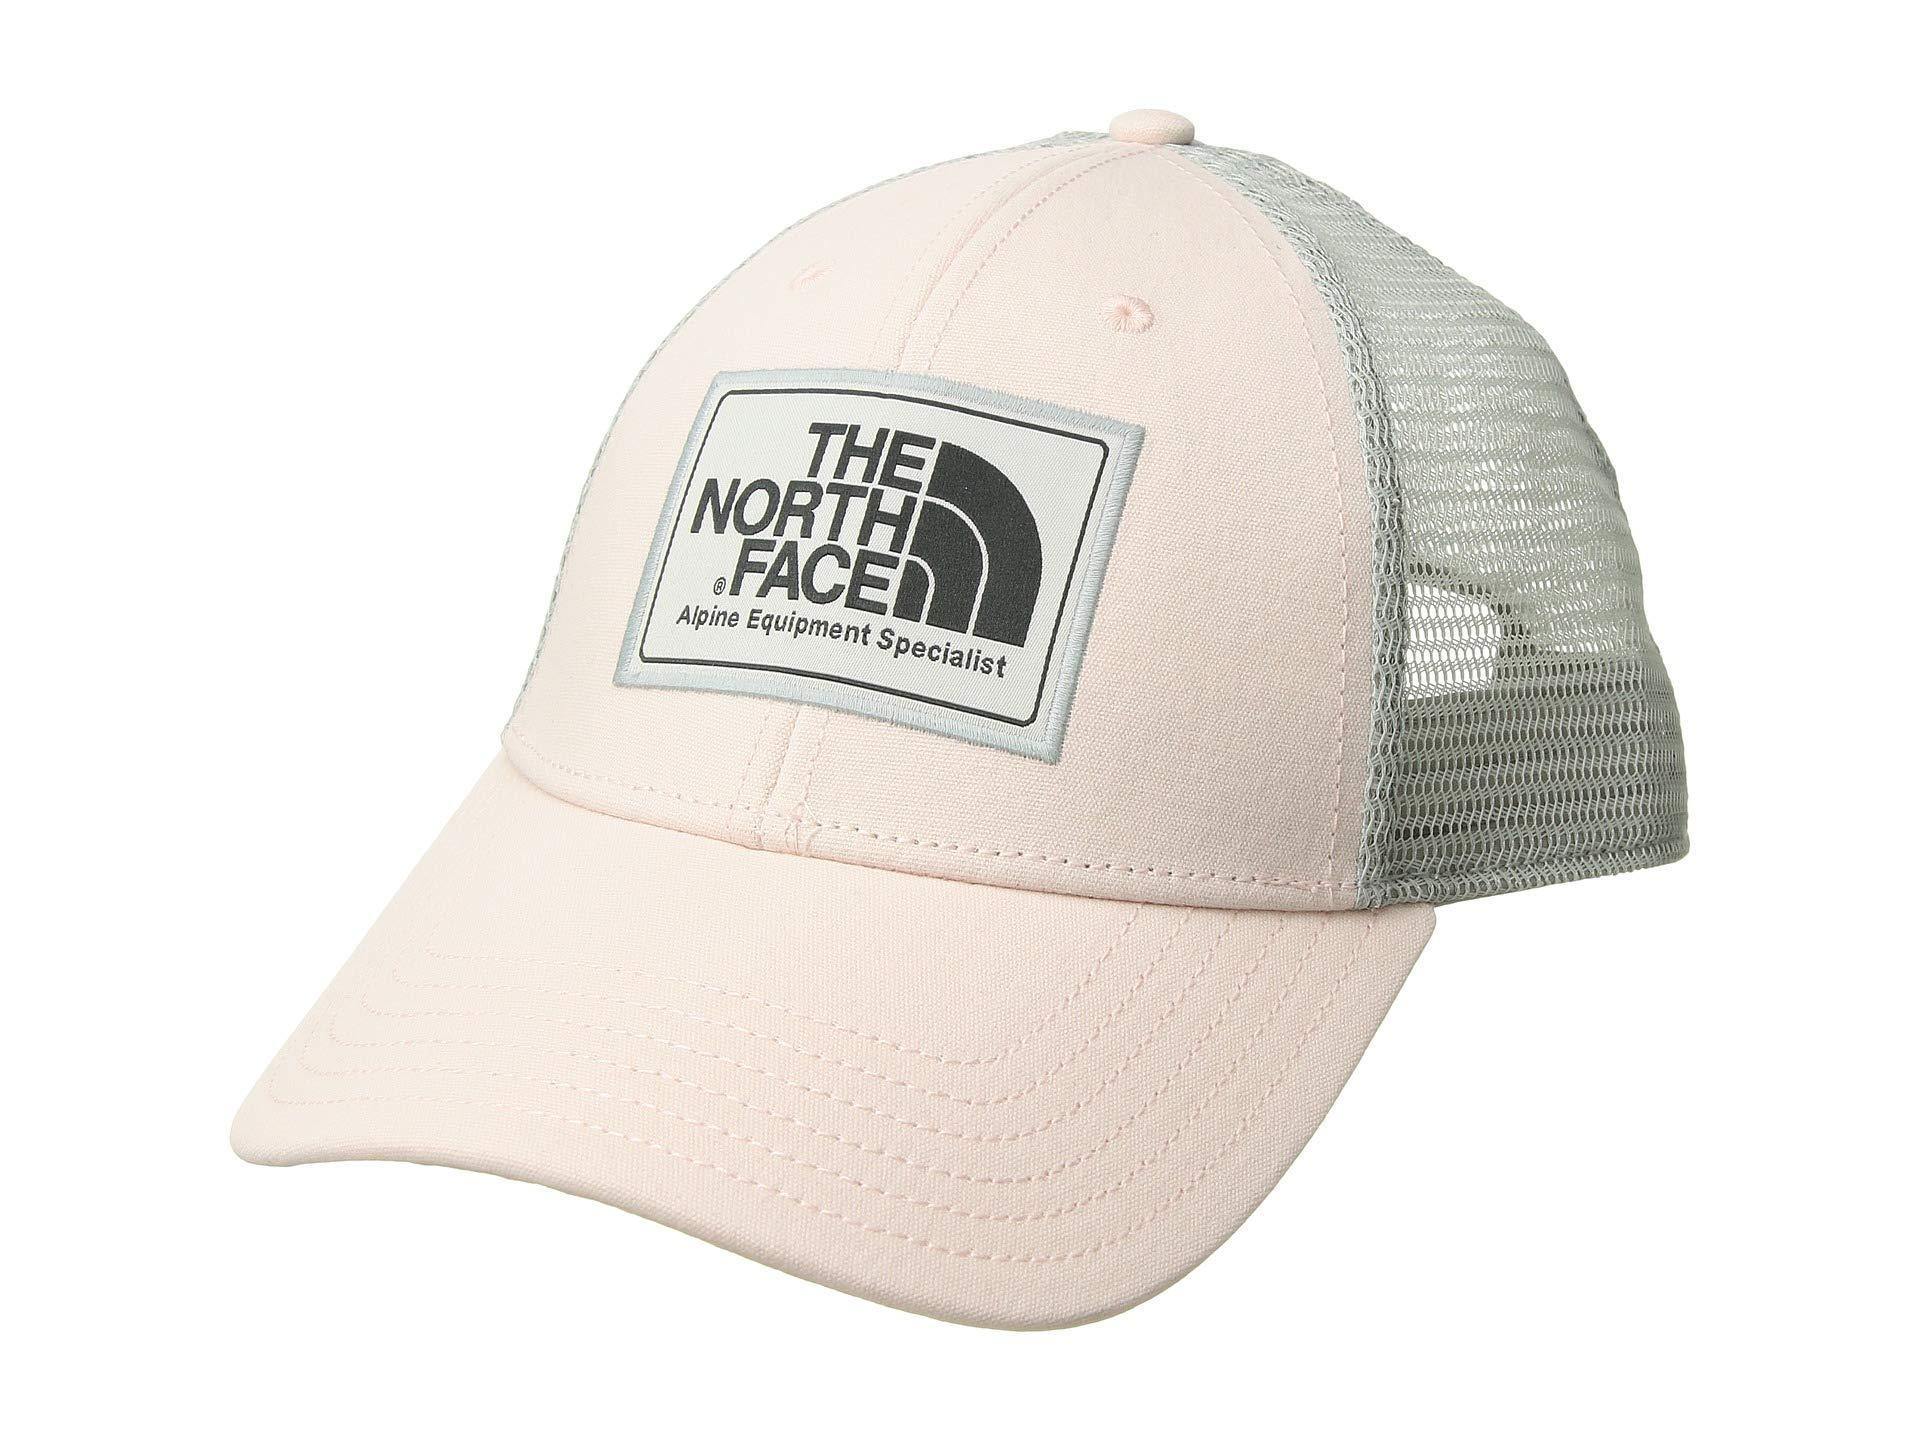 d50ce953 The North Face. Men's Gray Mudder Trucker Hat (tnf Medium Grey Heather/urban  Navy) Caps